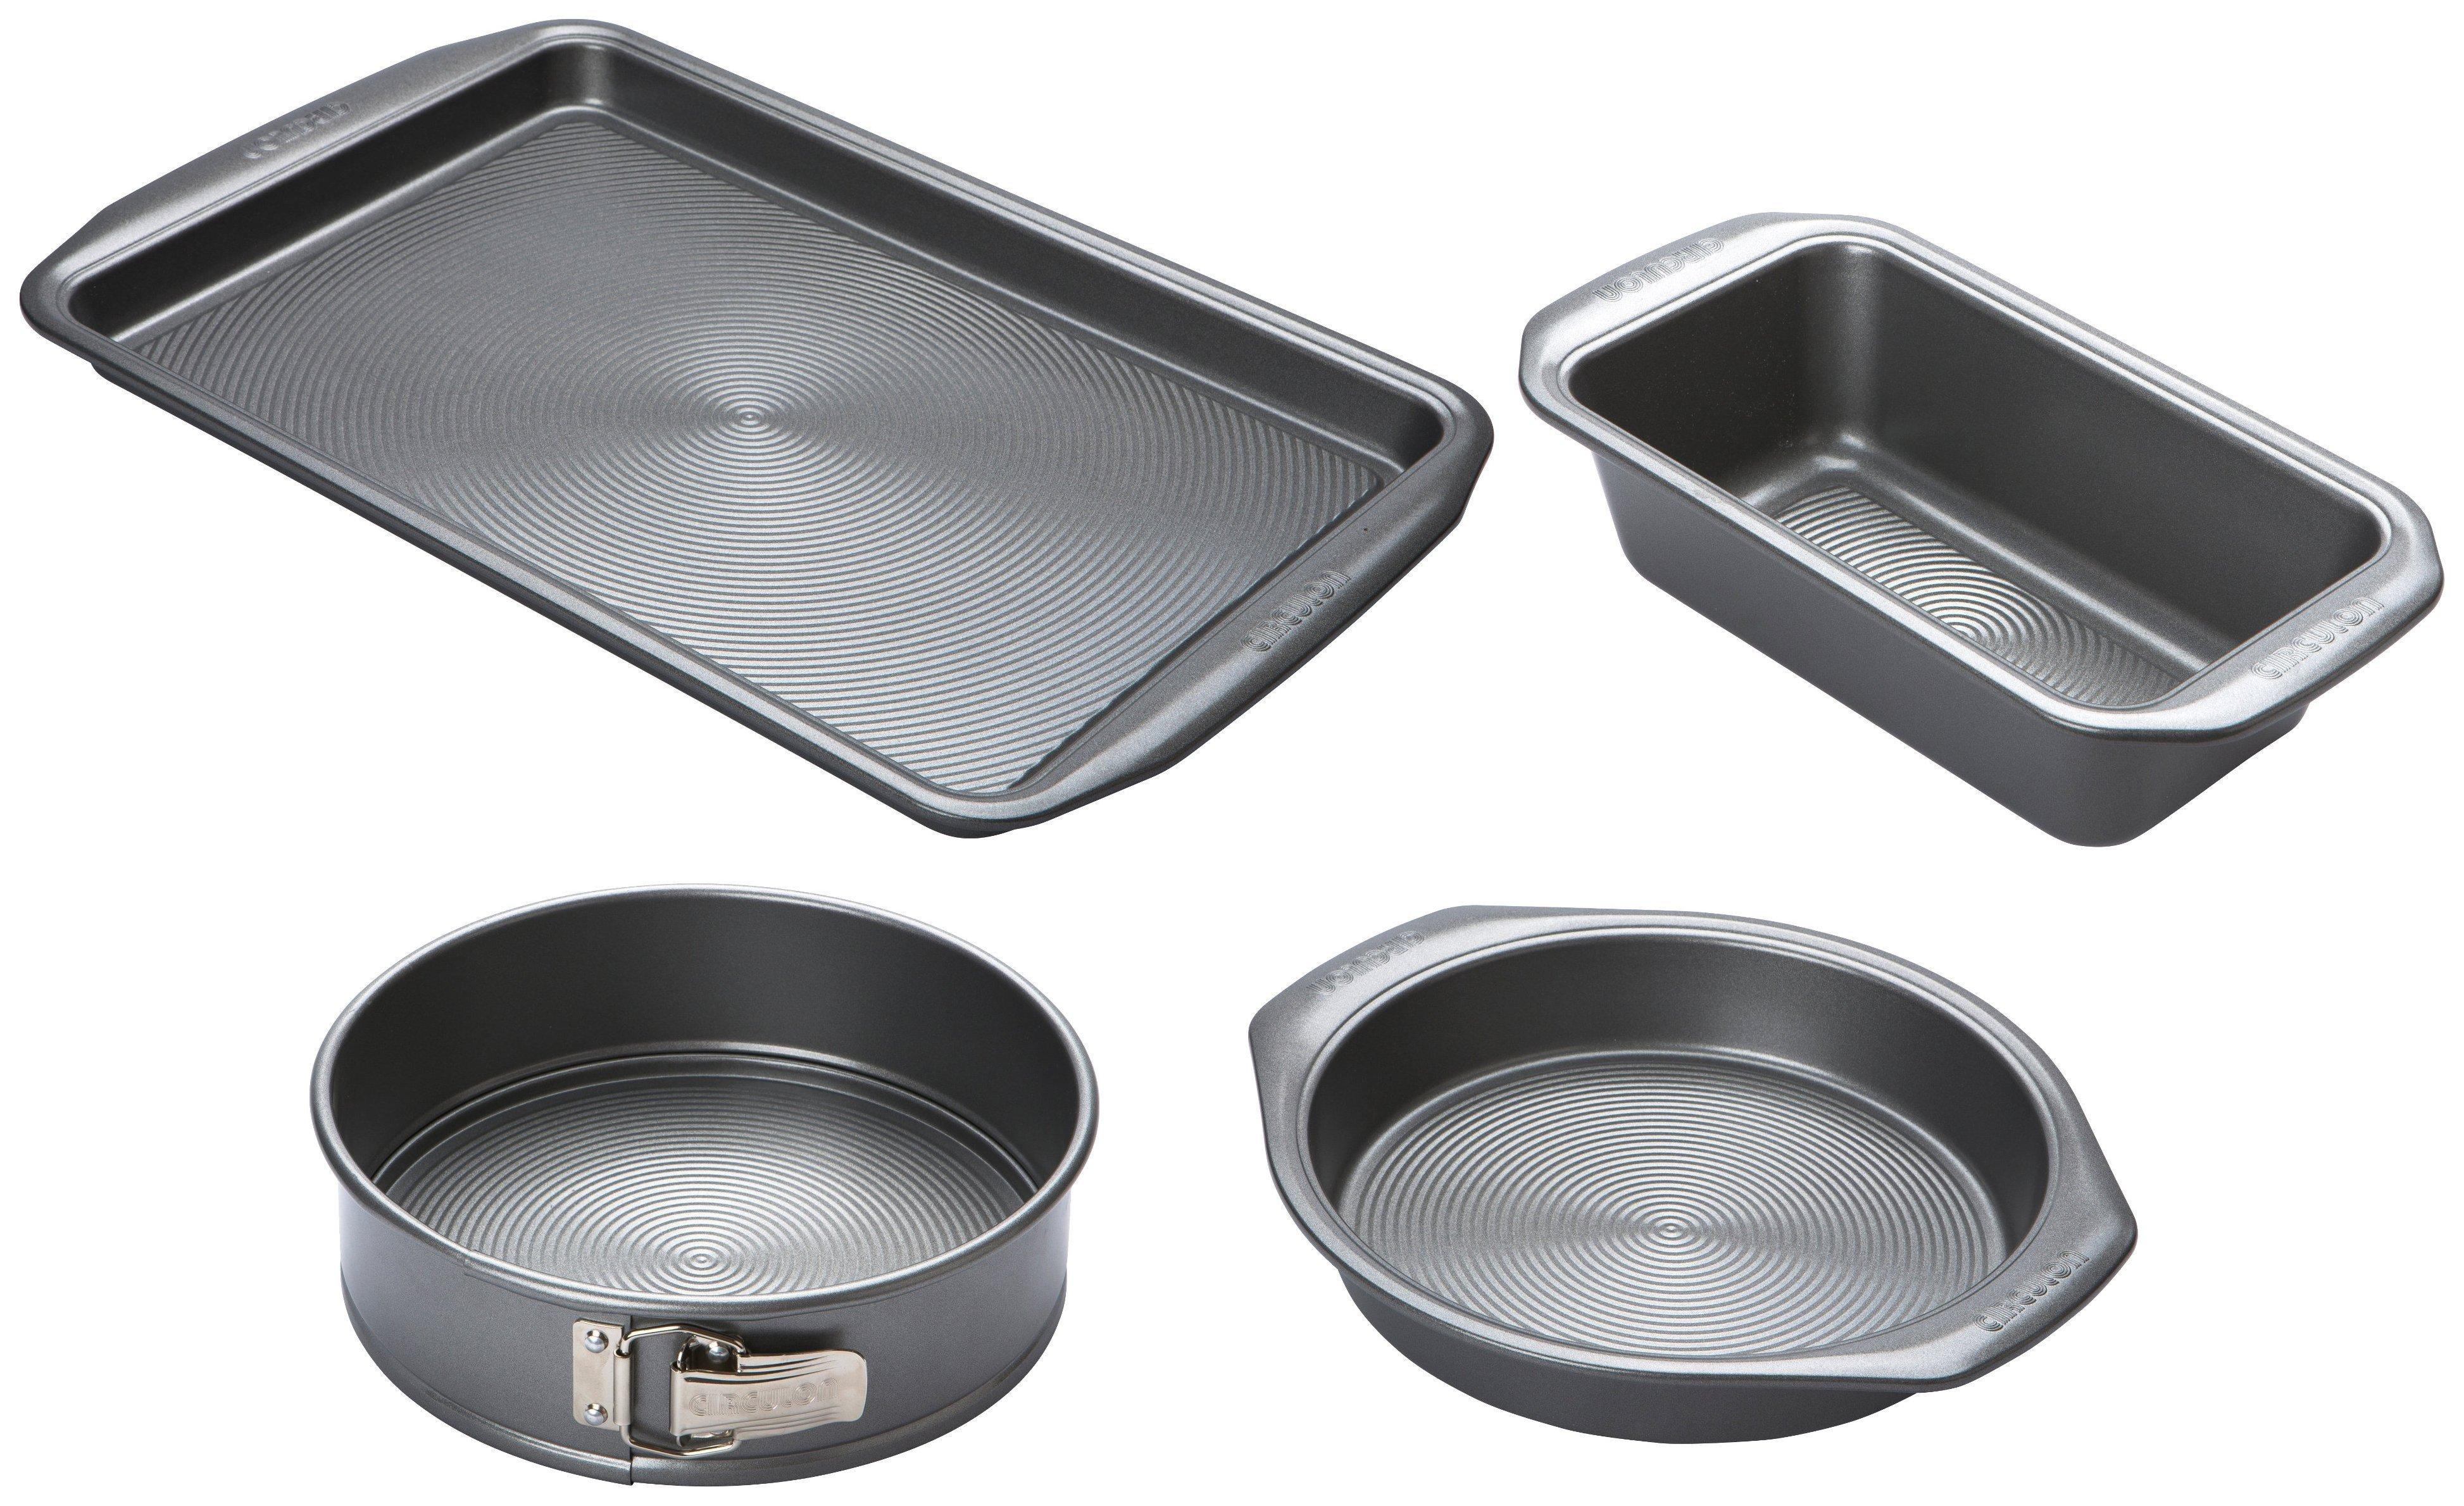 Image of Circulon 4 Piece Bakeware Set